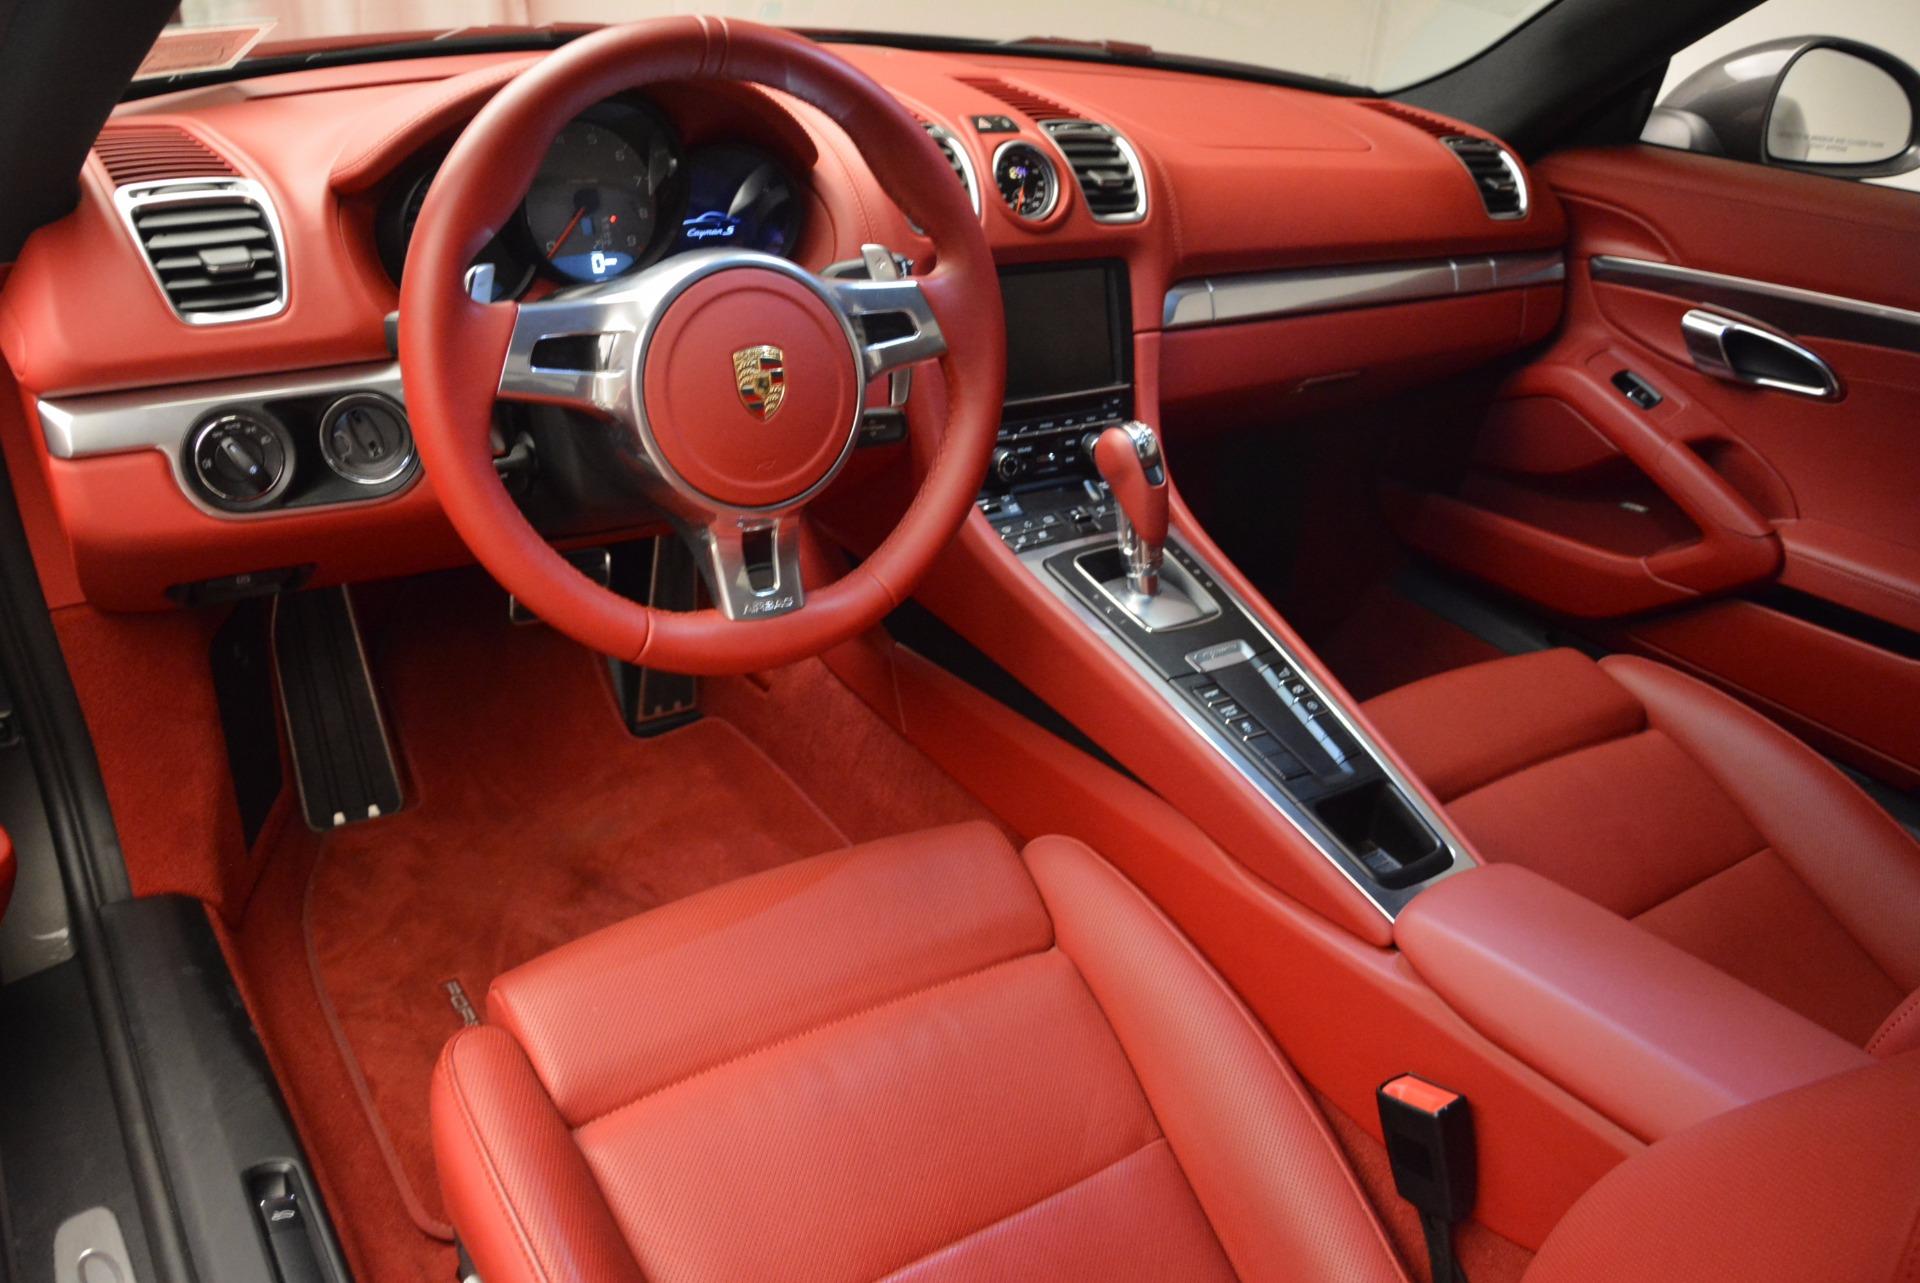 Used 2014 Porsche Cayman S S